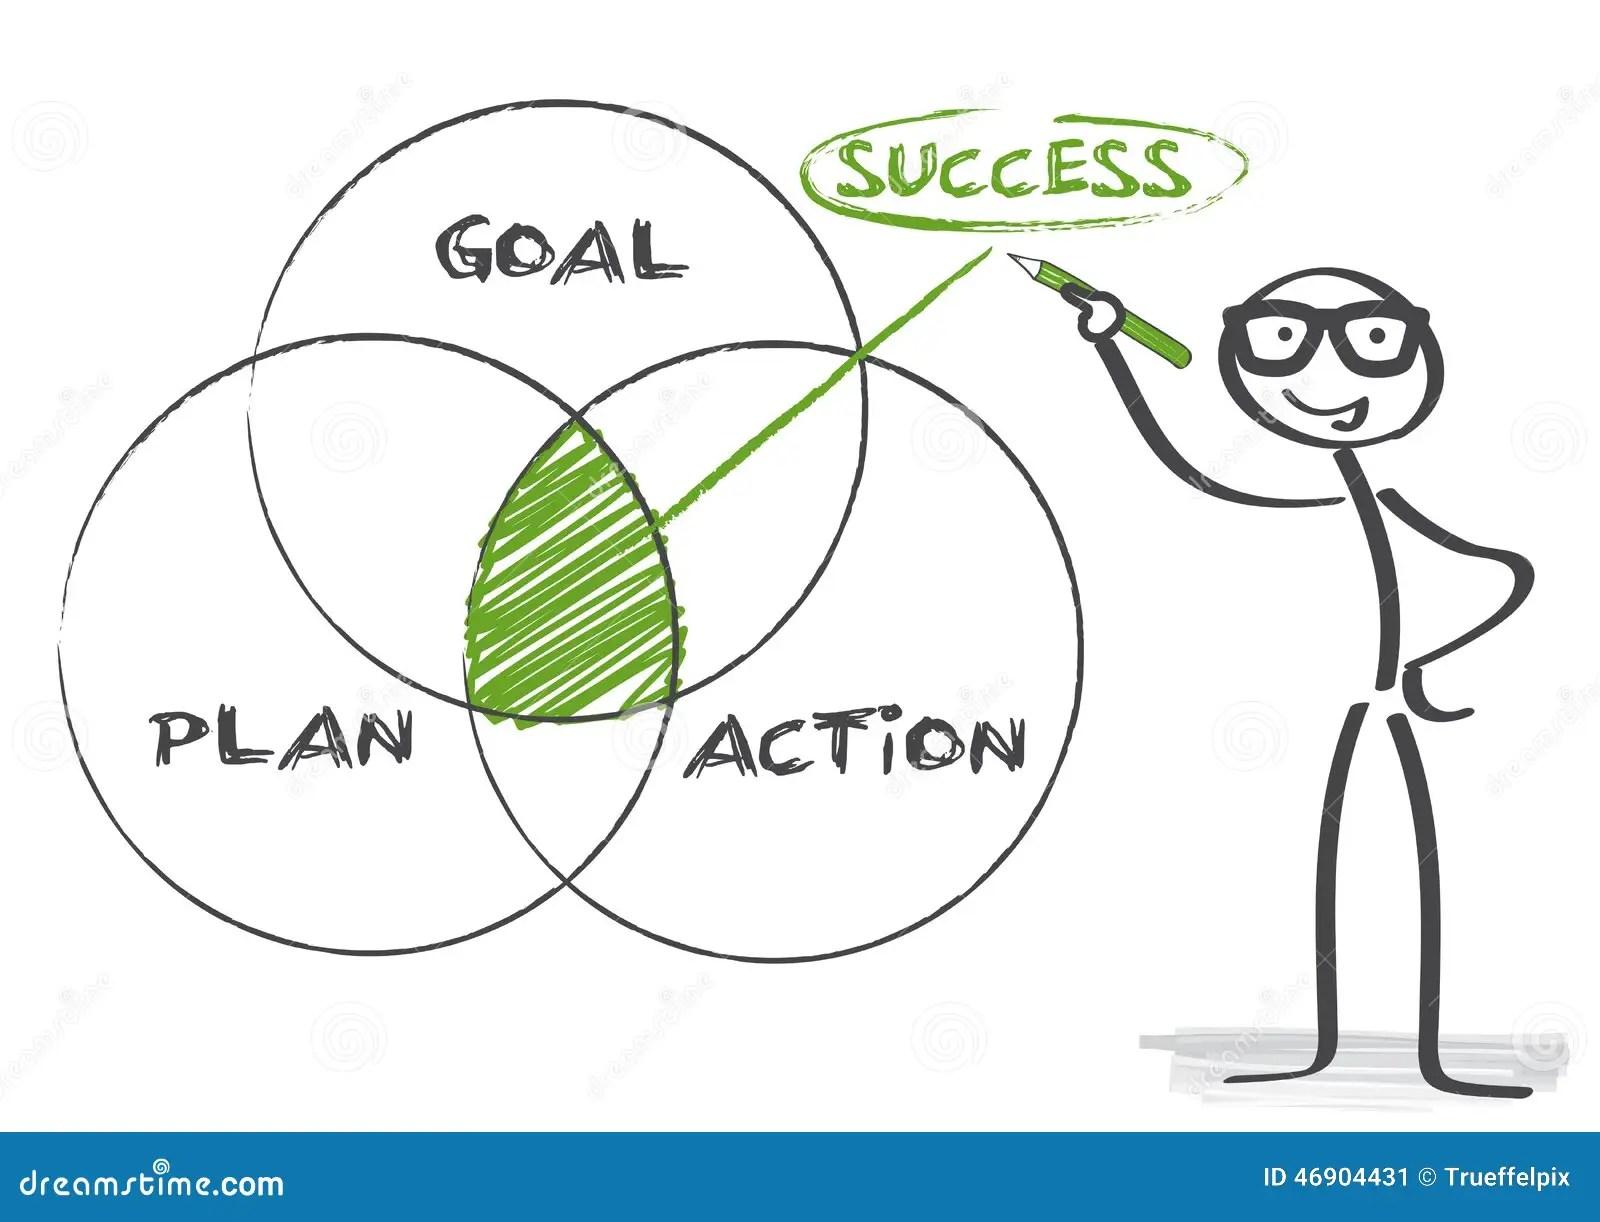 Goal Plan Action Success Stock Illustration Illustration